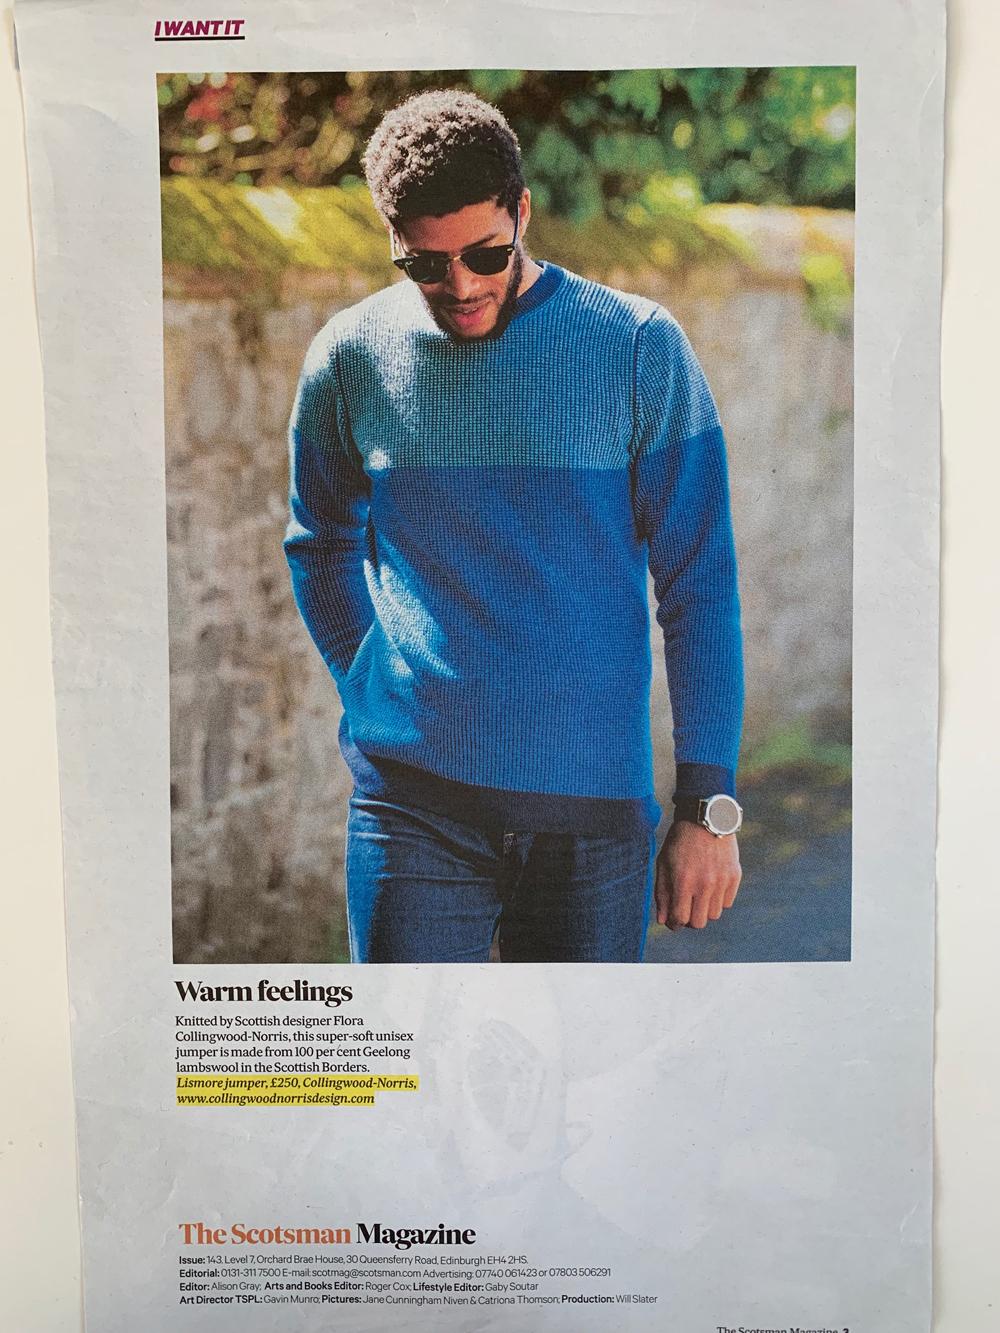 The Scotsman Magazine, June 2018